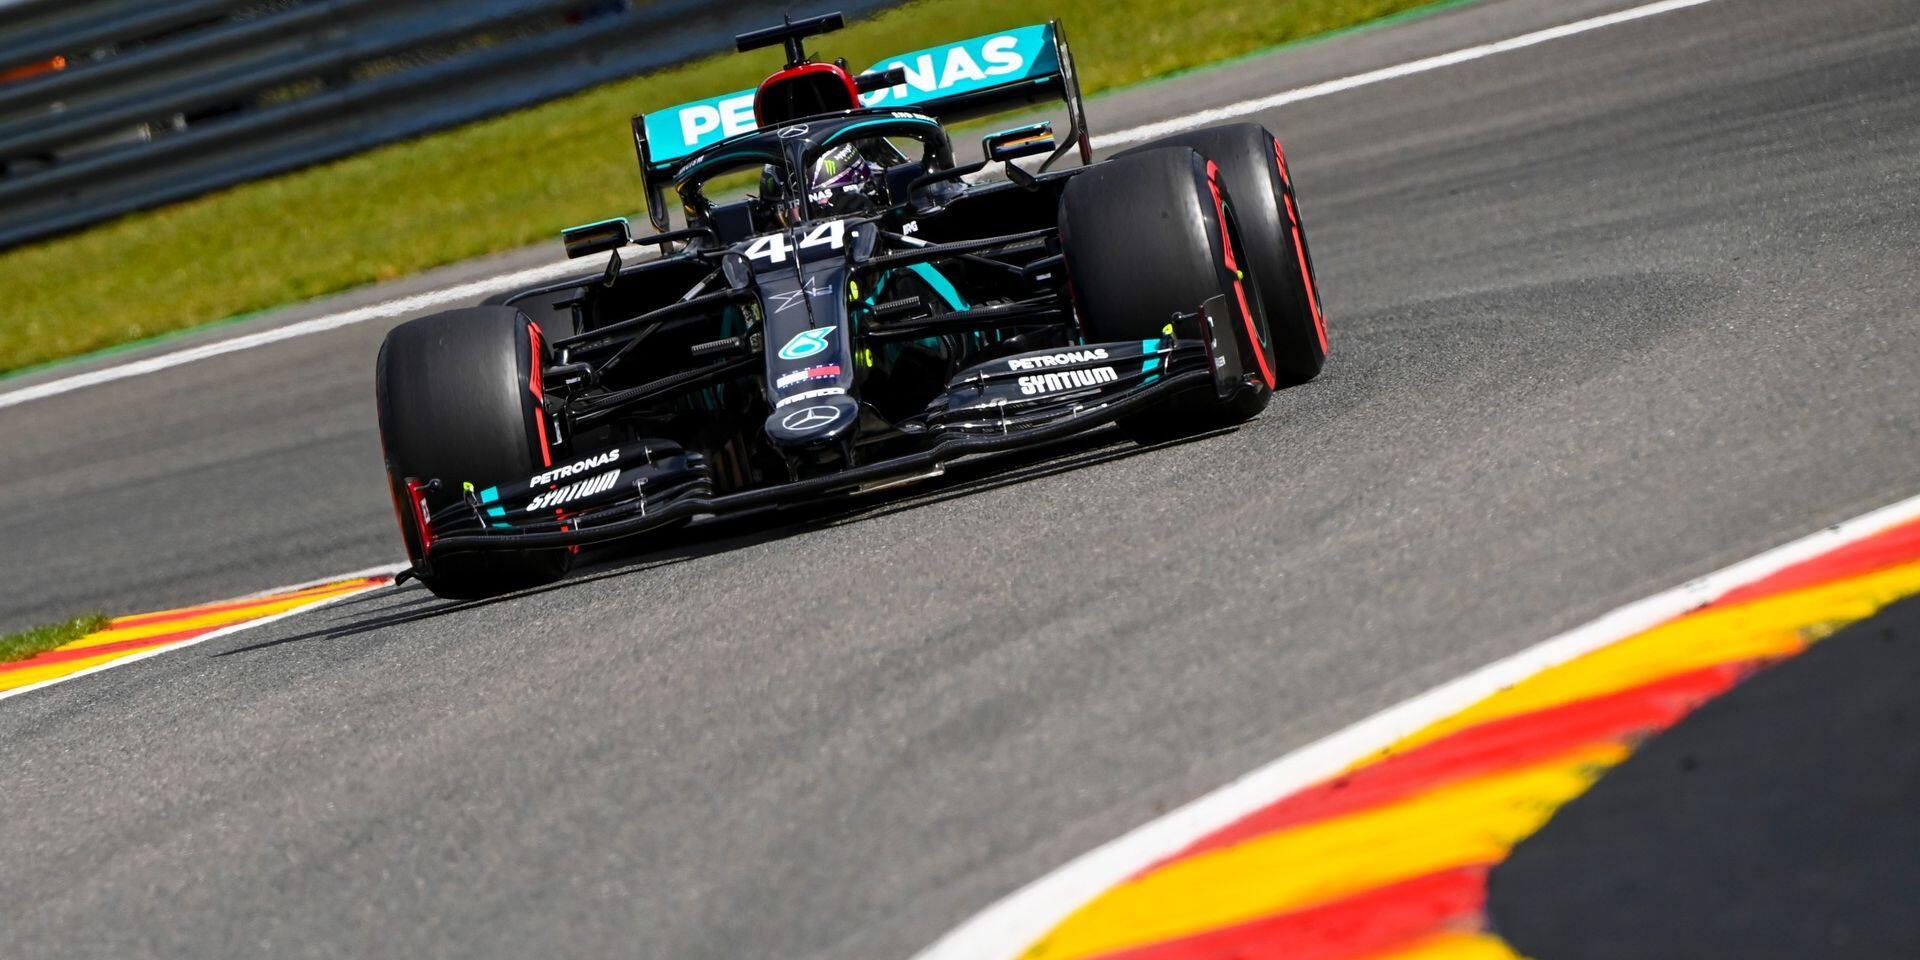 GP de Toscane F1 : Le pronostic d'Olivier de Wilde